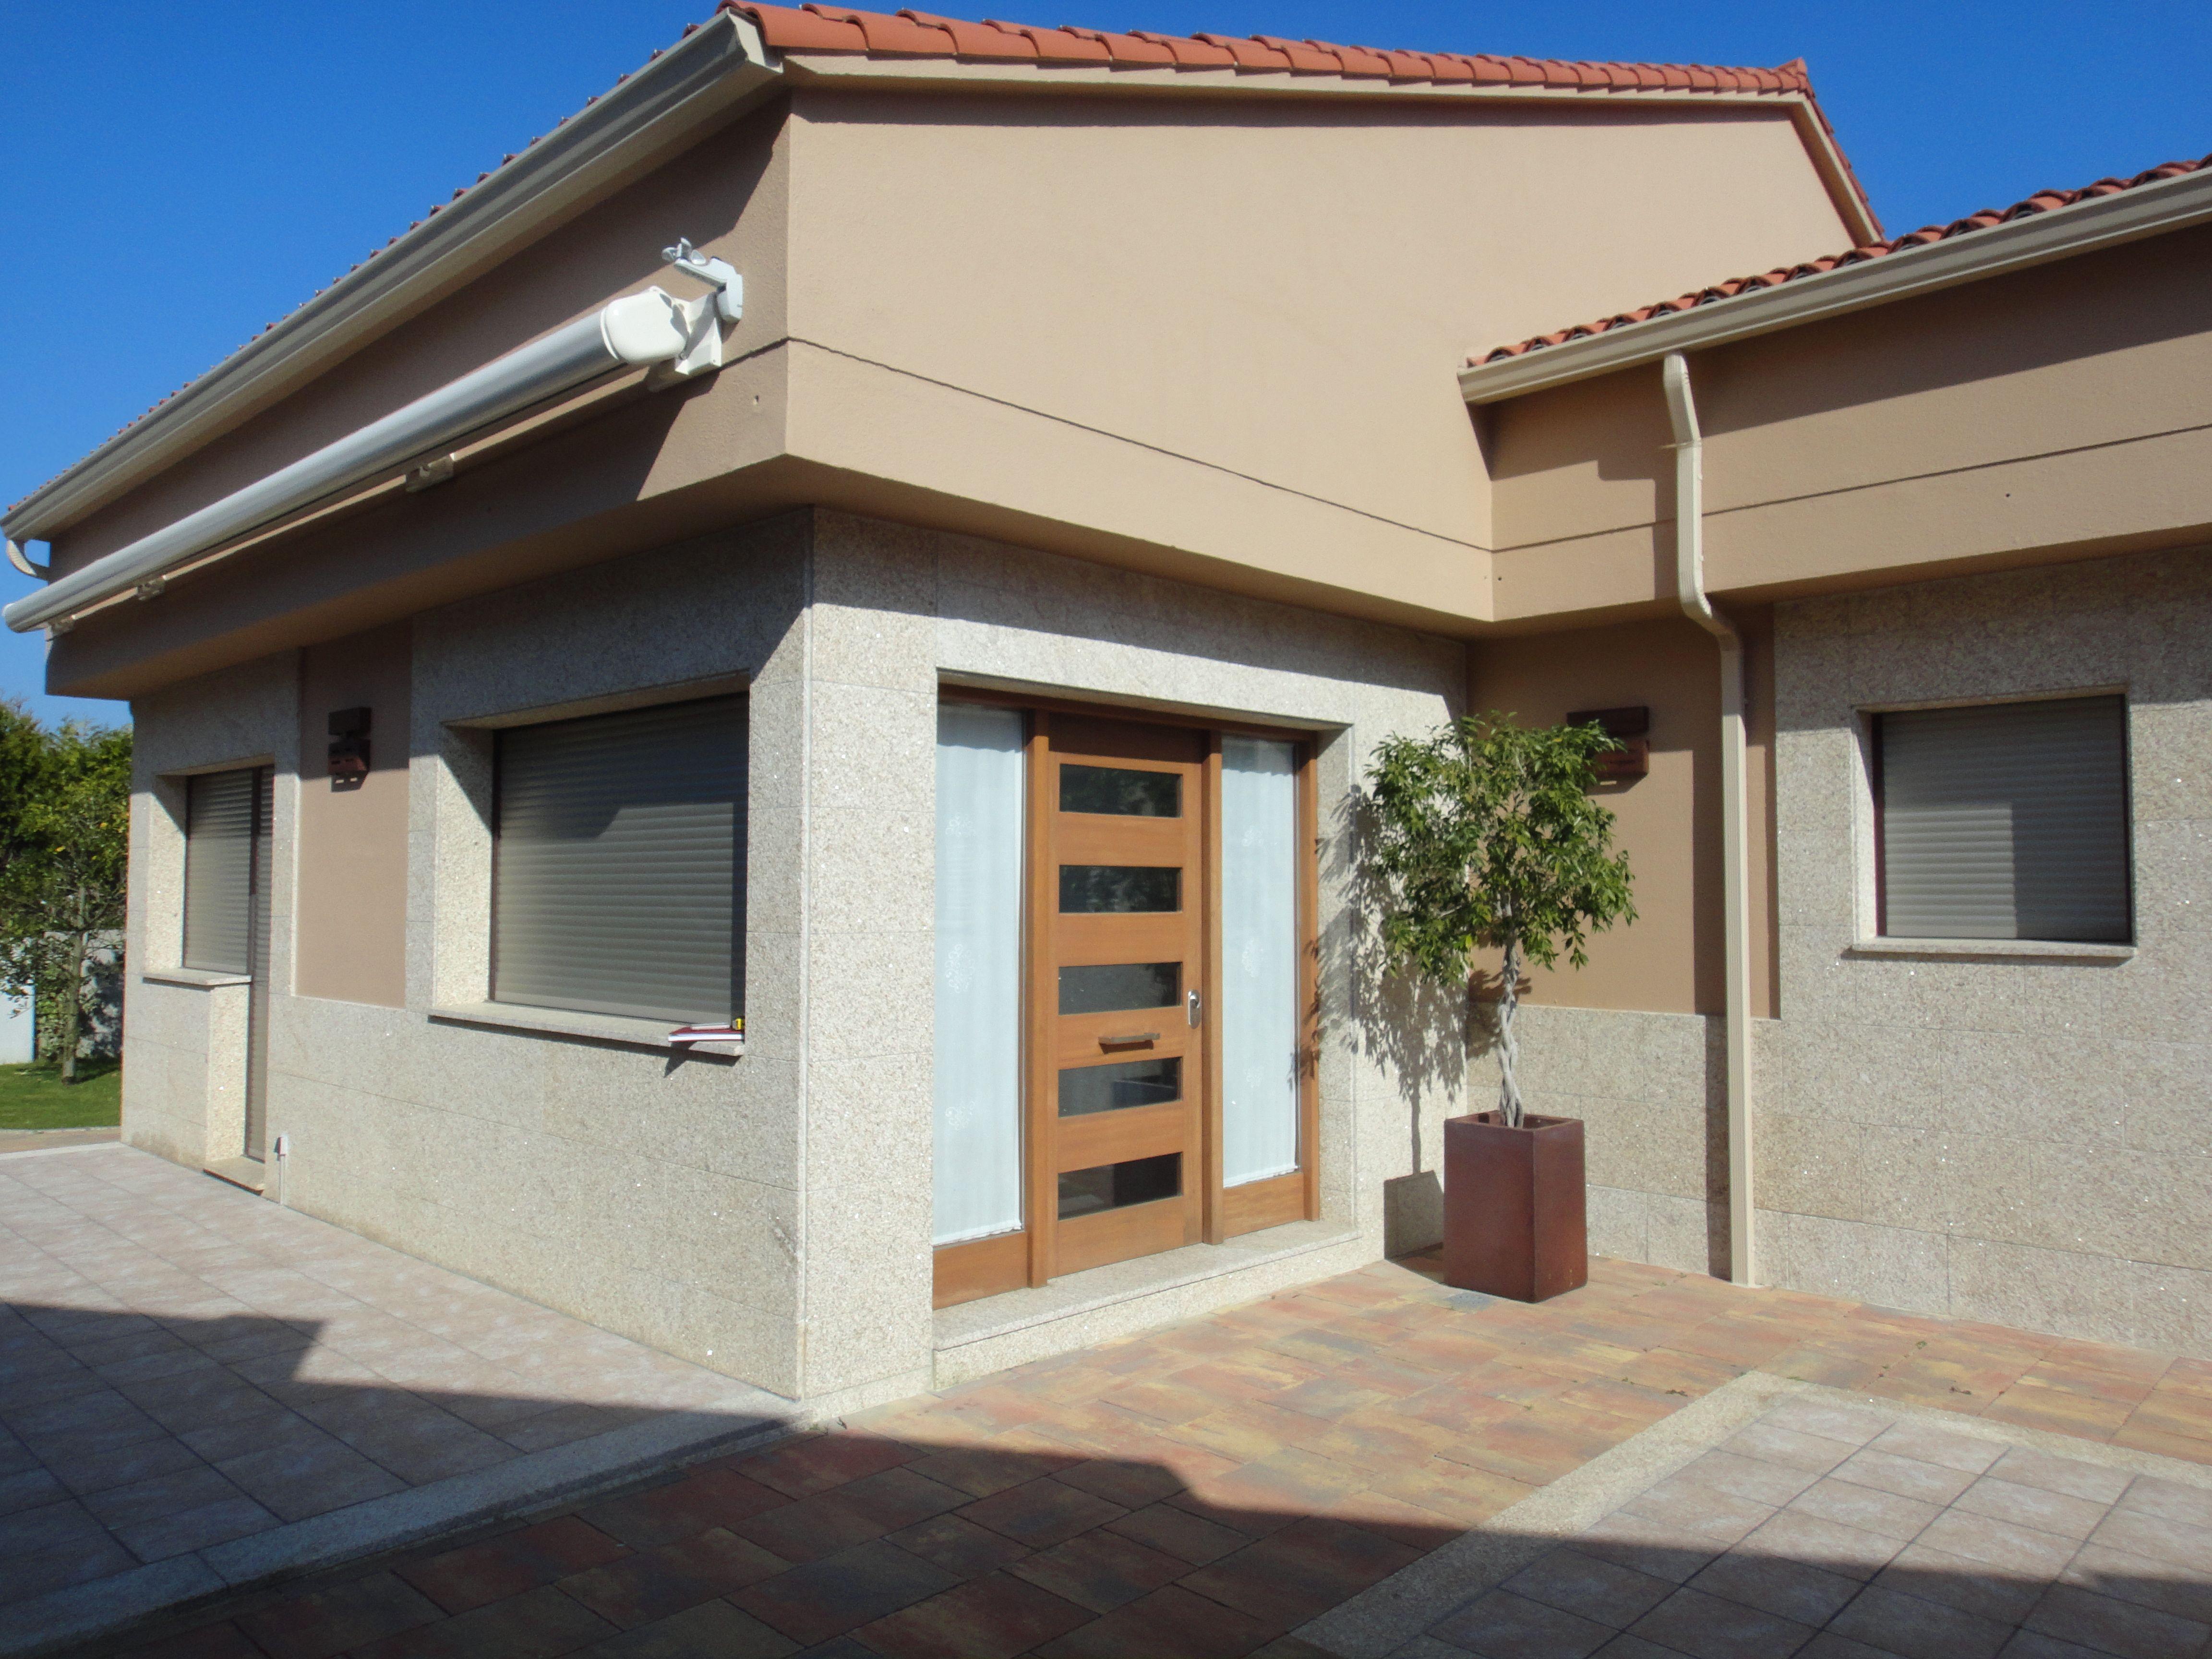 Df5411 esquemas de color casa exteriores con persianas negras - Exterior Style Contemporaneo Color Marron Beige Marron Marron Gris Dise Ado Por Fernando Sanmartin